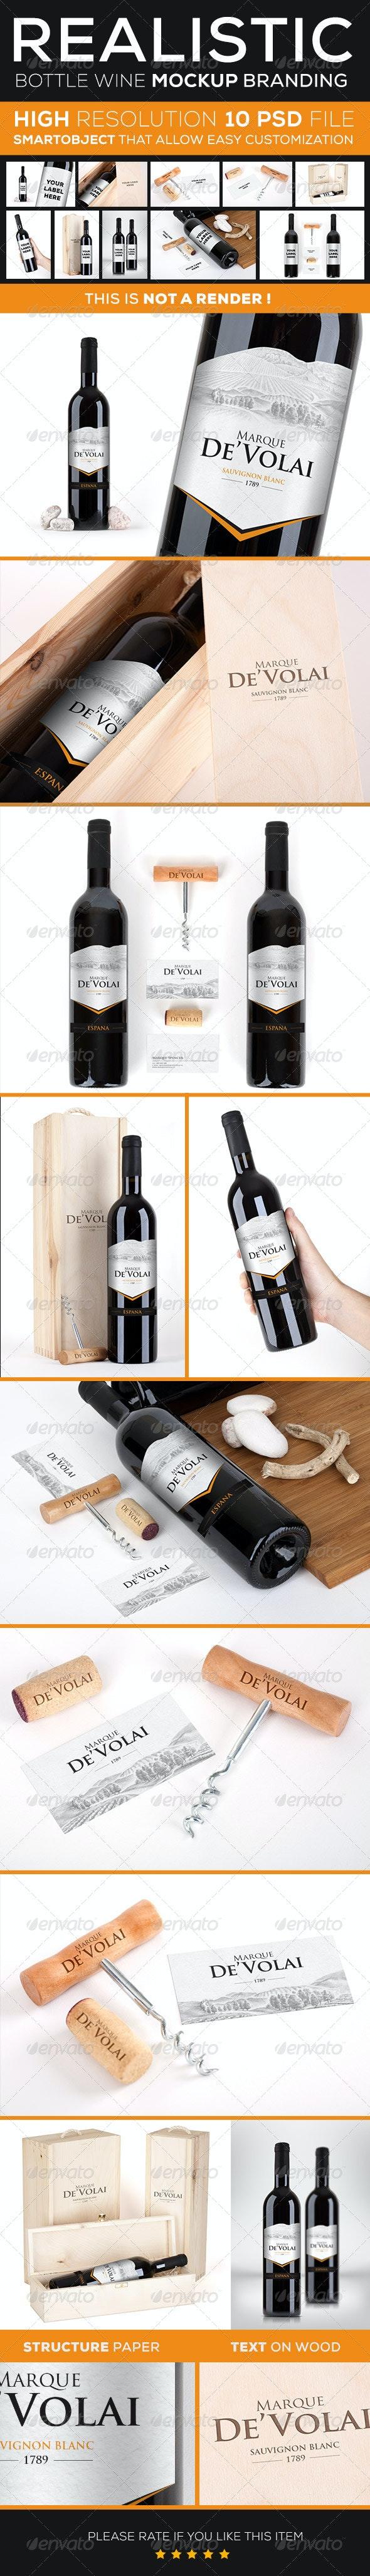 Wine Bottle Branding Mock Up  - Product Mock-Ups Graphics